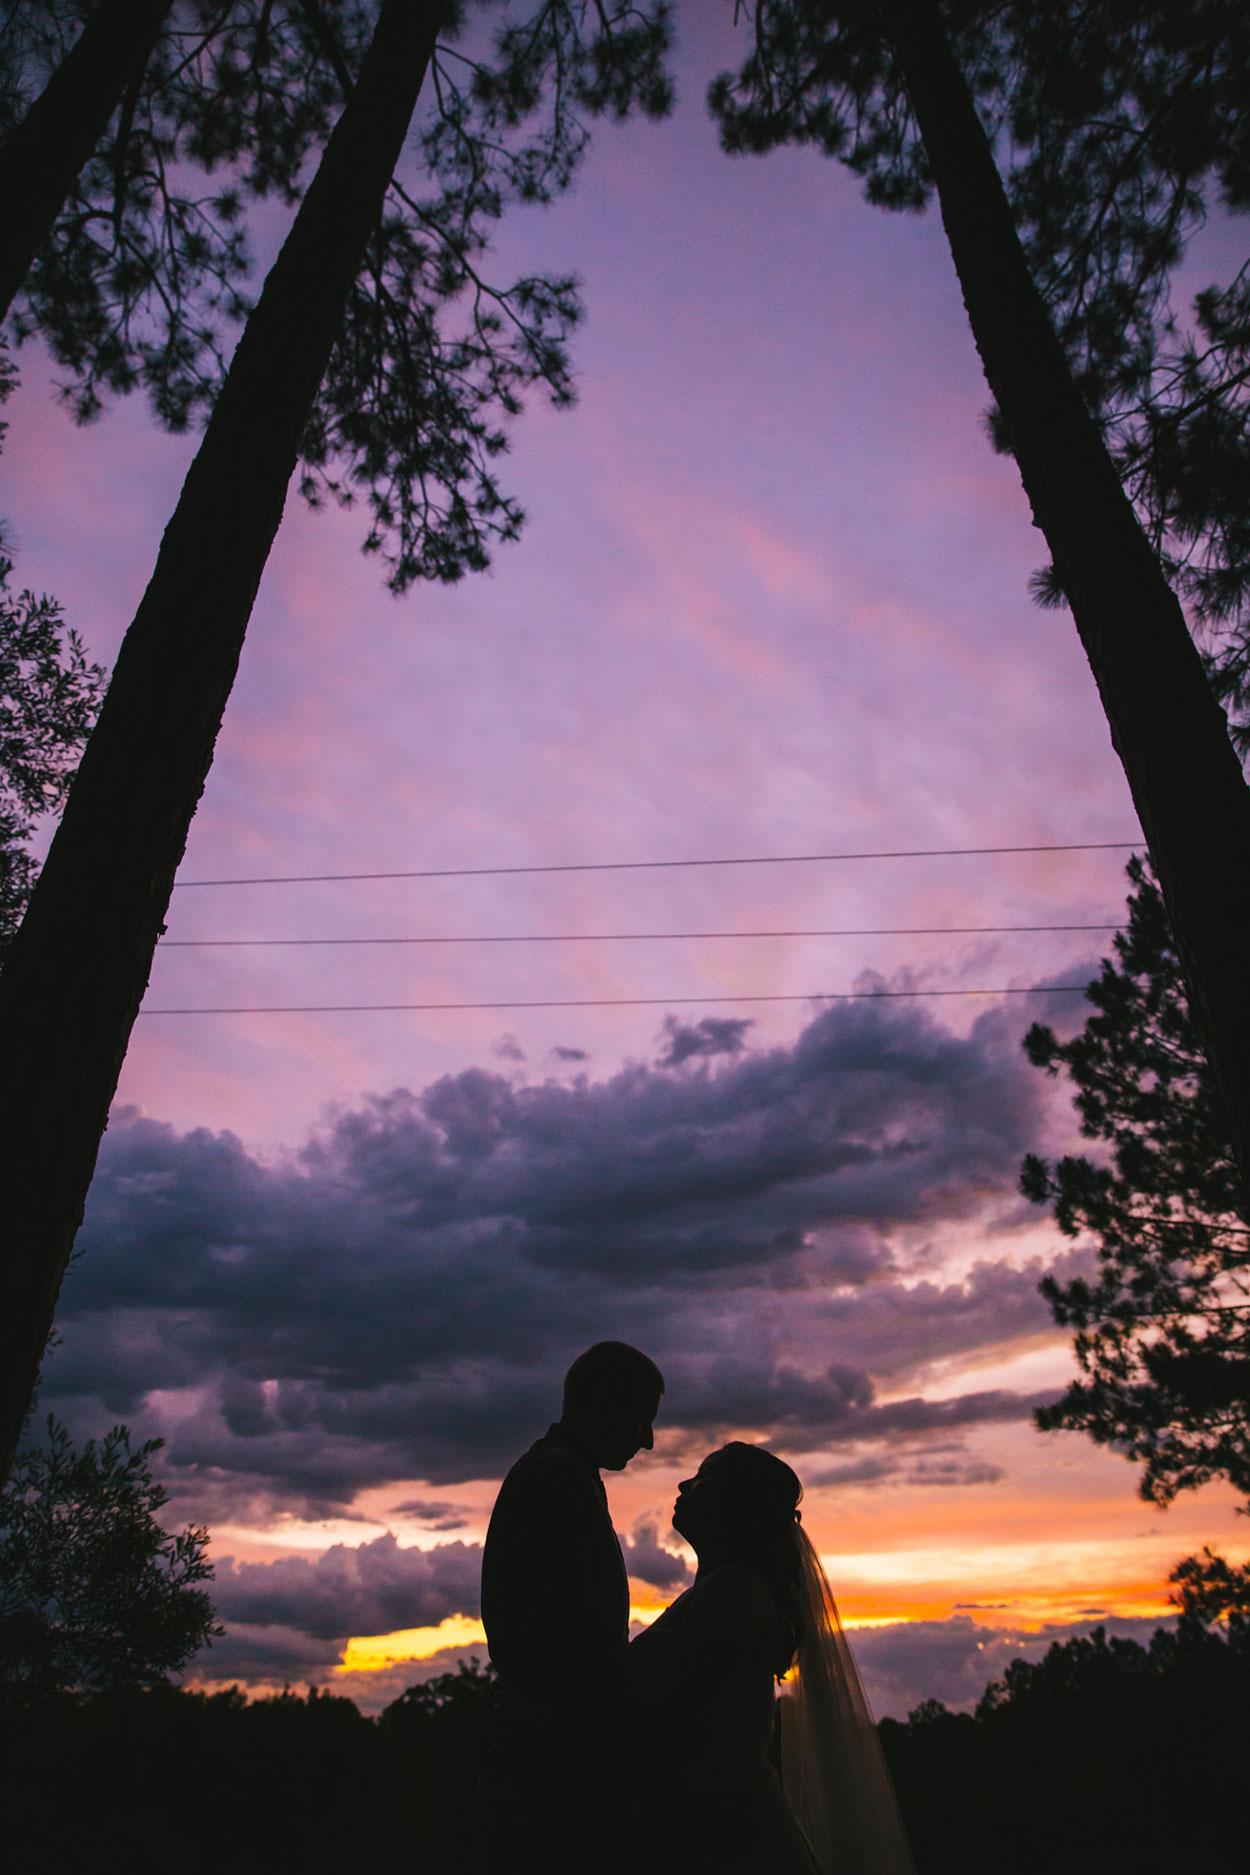 Sunshine-coast-wedding-photographers-noosa-maleny-flaxton-mapleton-montville-hinterland-coolum-mooloolaba-maroochydore-caloundra-beach-elopement-eco-friendly-best-photos-115.jpg